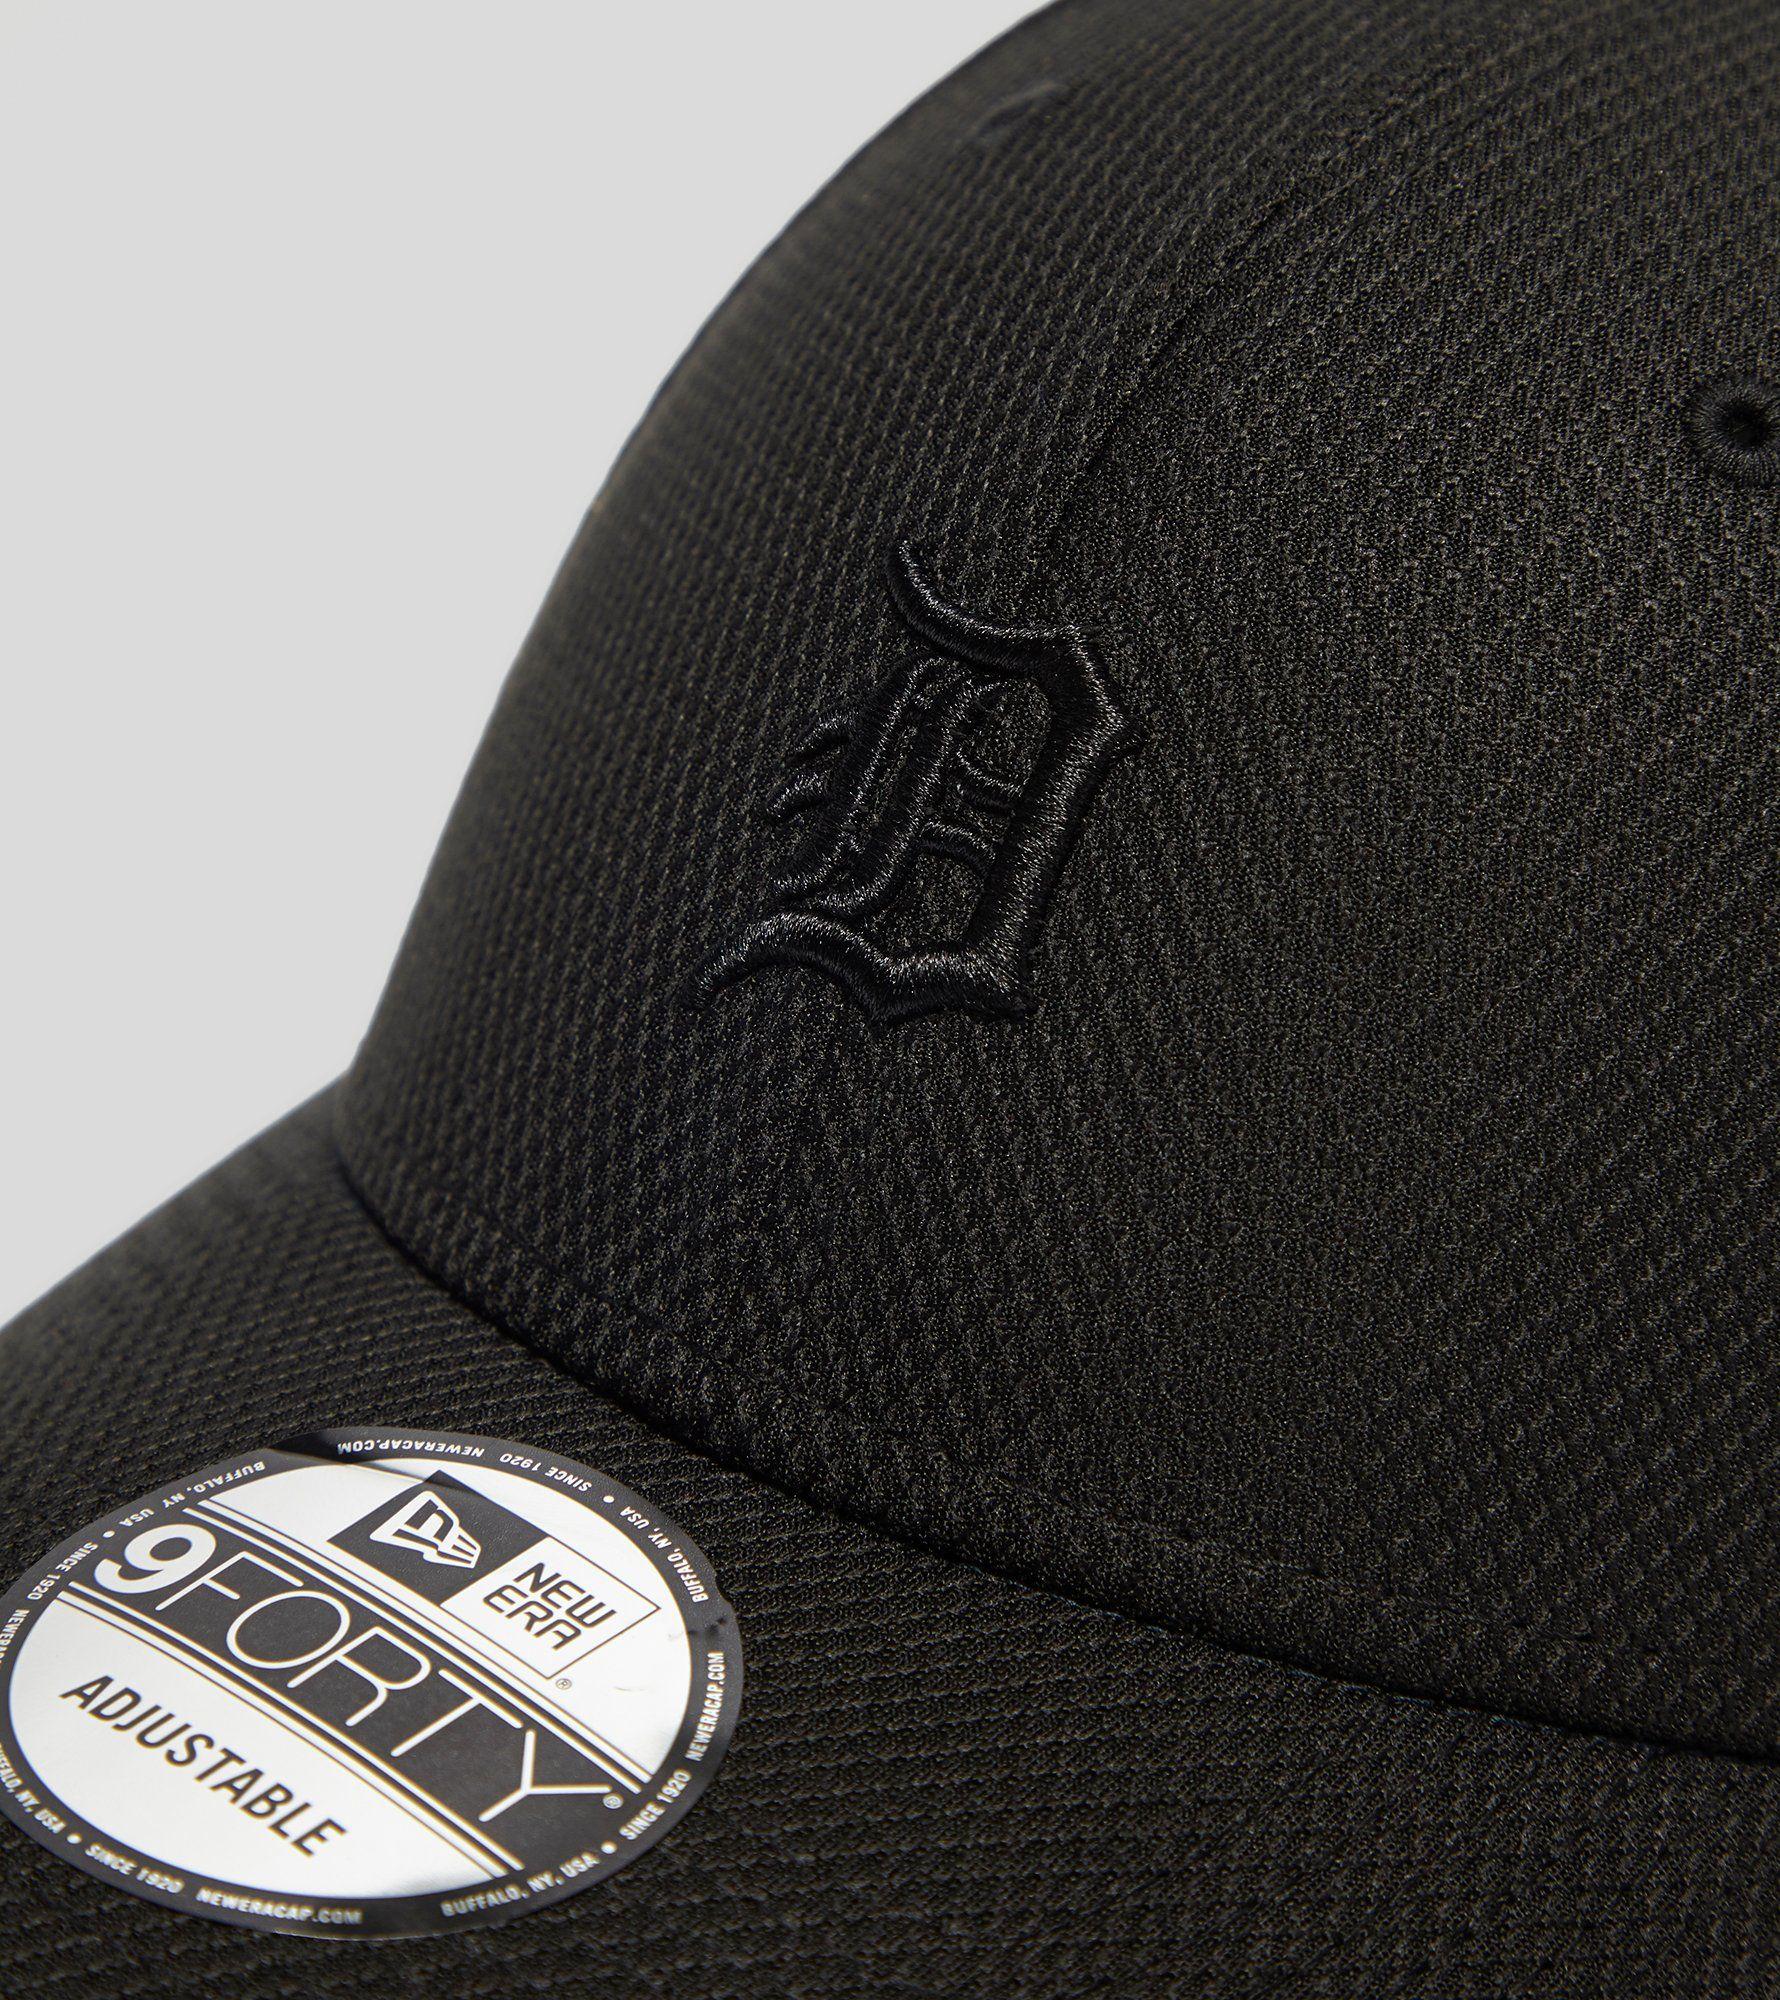 New Era 9FORTY Diamond Era Detroit Tigers Cap